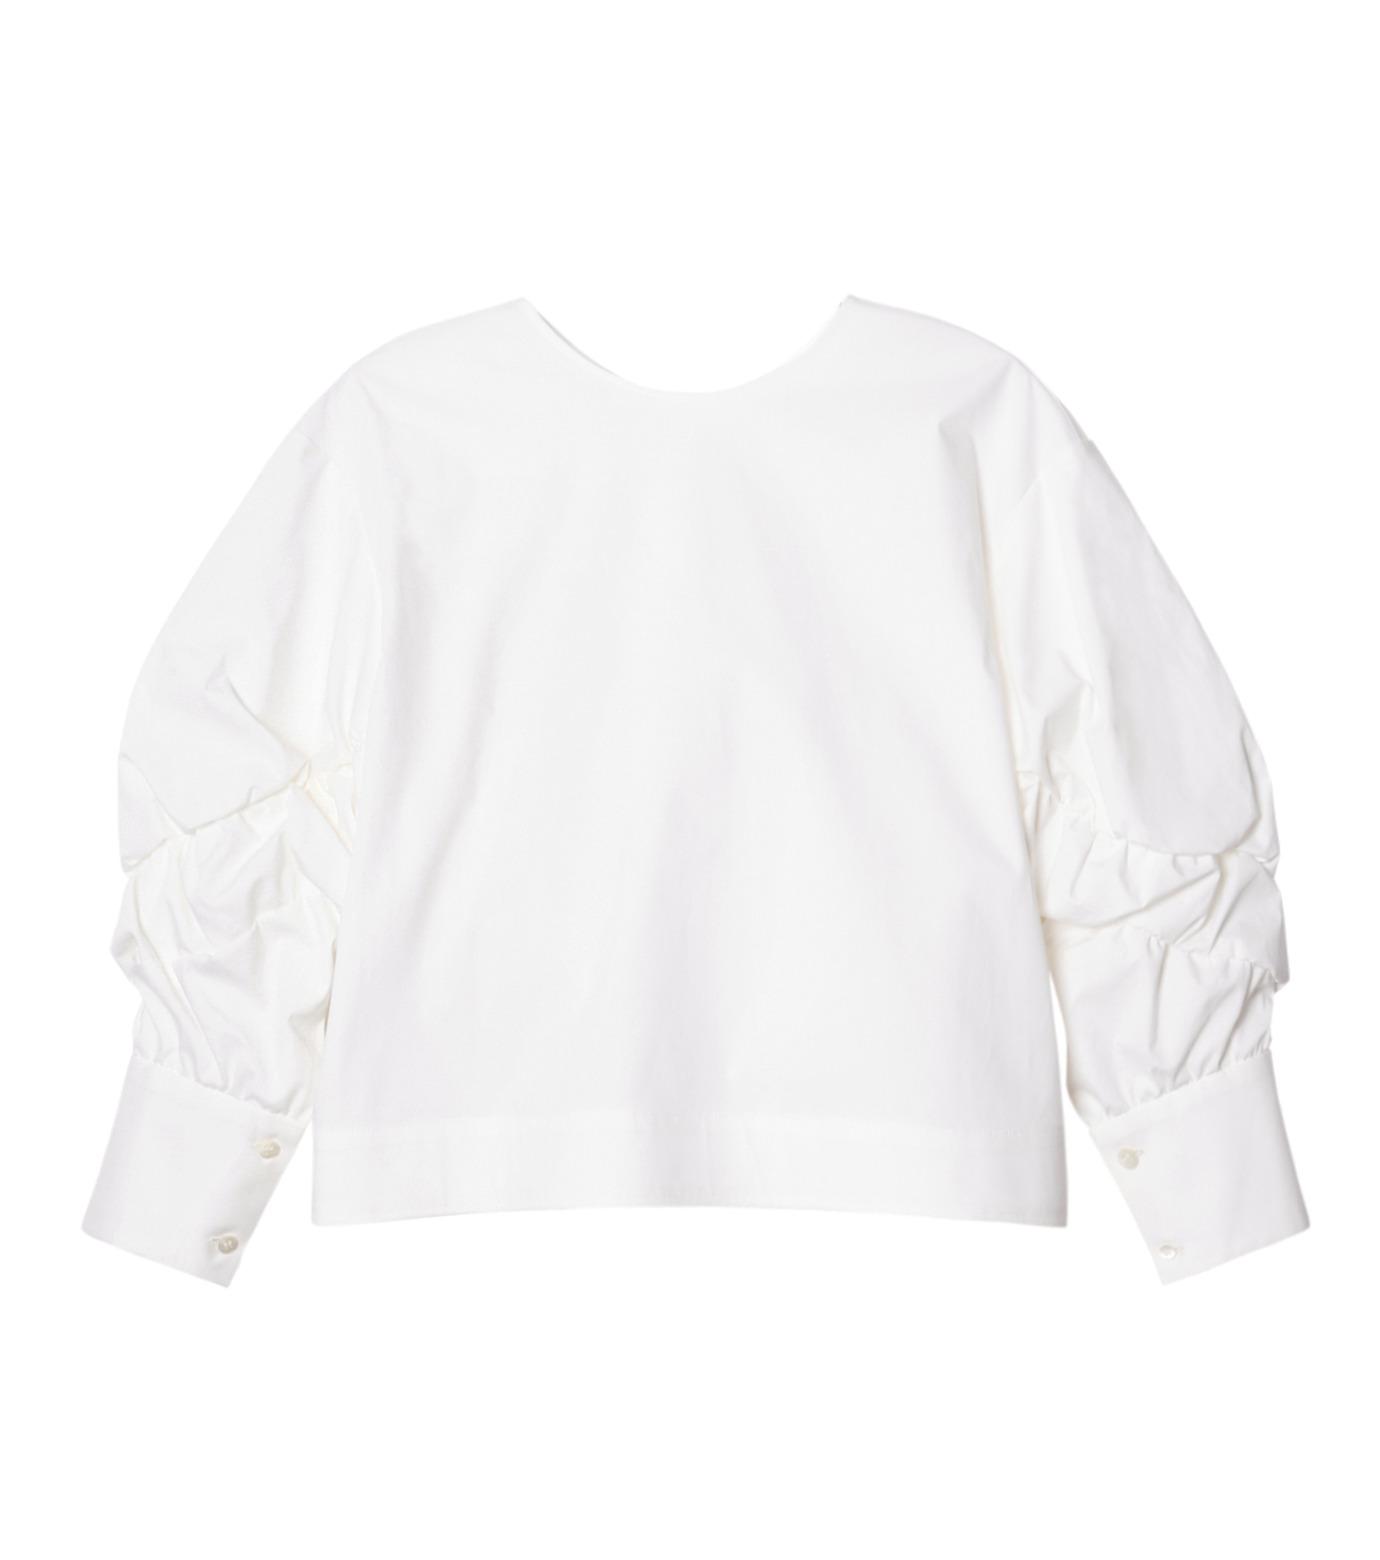 LE CIEL BLEU(ルシェルブルー)のタイプライターシュリンクスリーブトップス-WHITE(シャツ/shirt)-19S63104 拡大詳細画像1